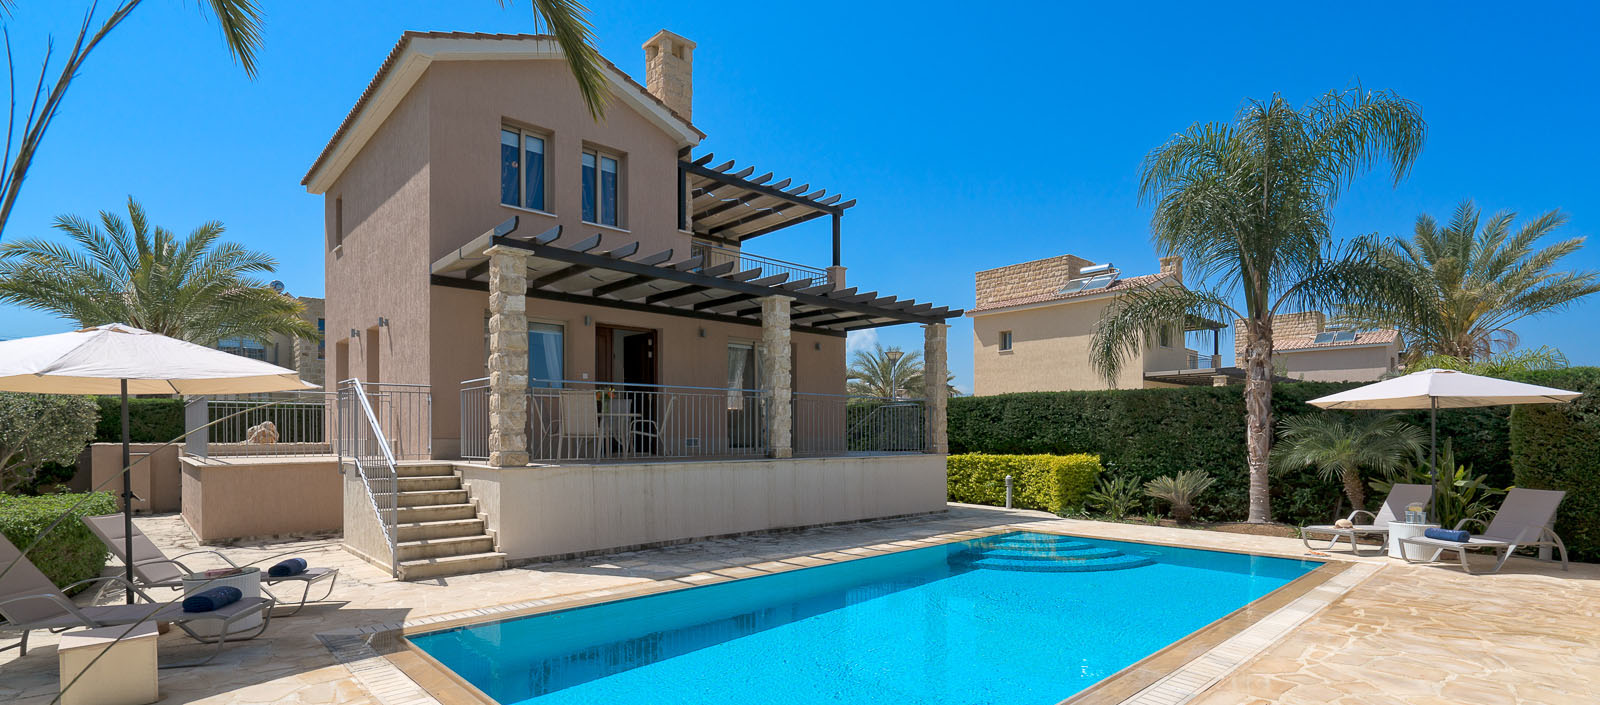 Cyprus Holiday Villa 491600